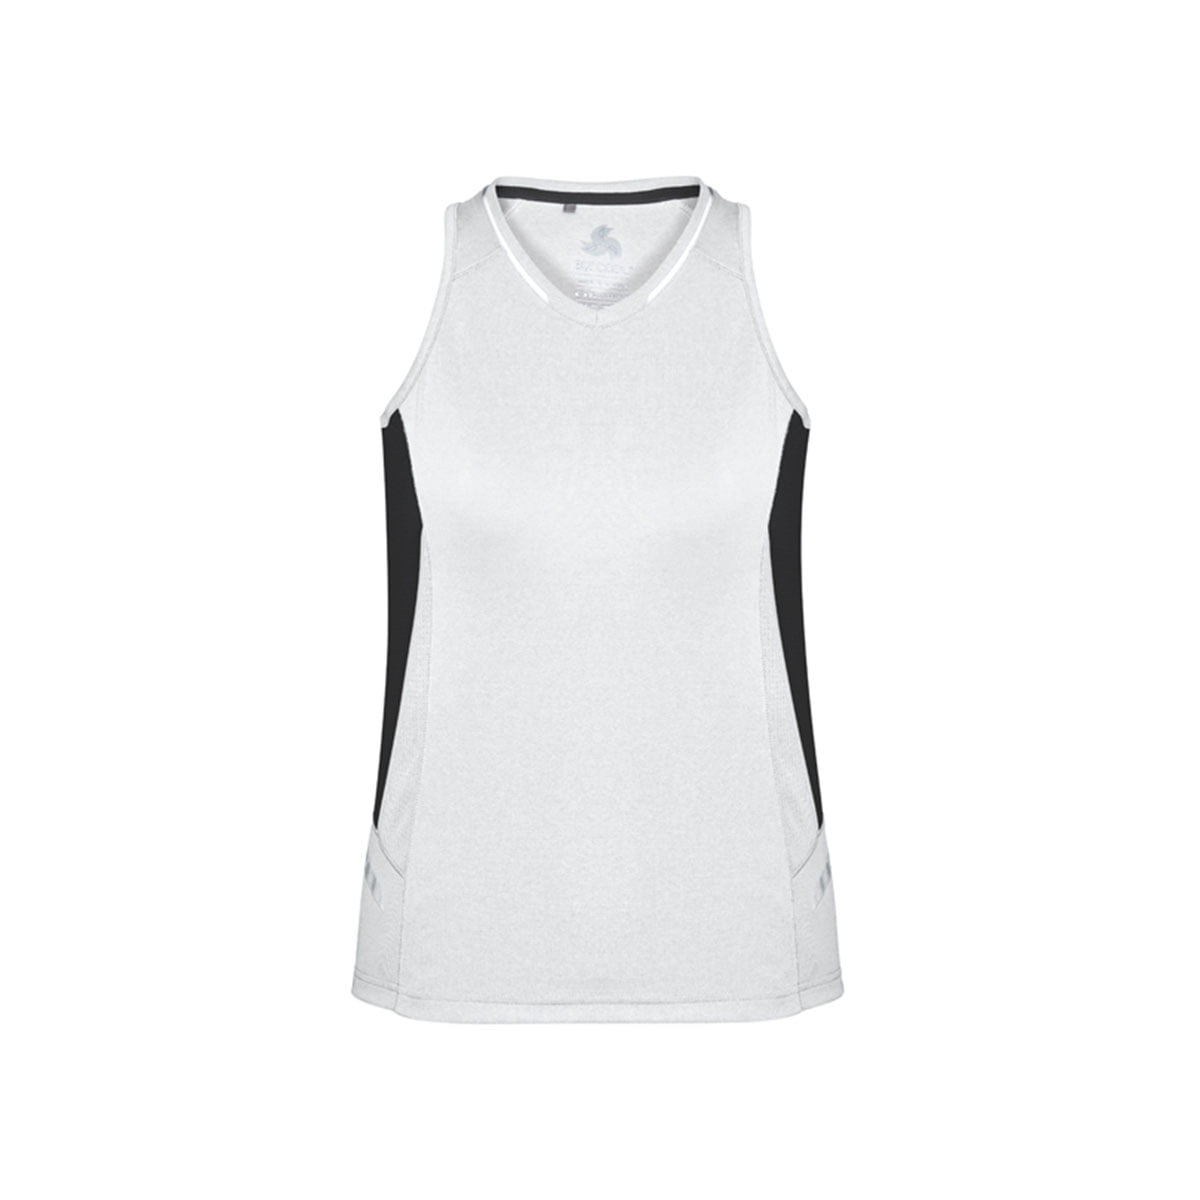 Ladies Renegade Singlet-White / Black / Silver